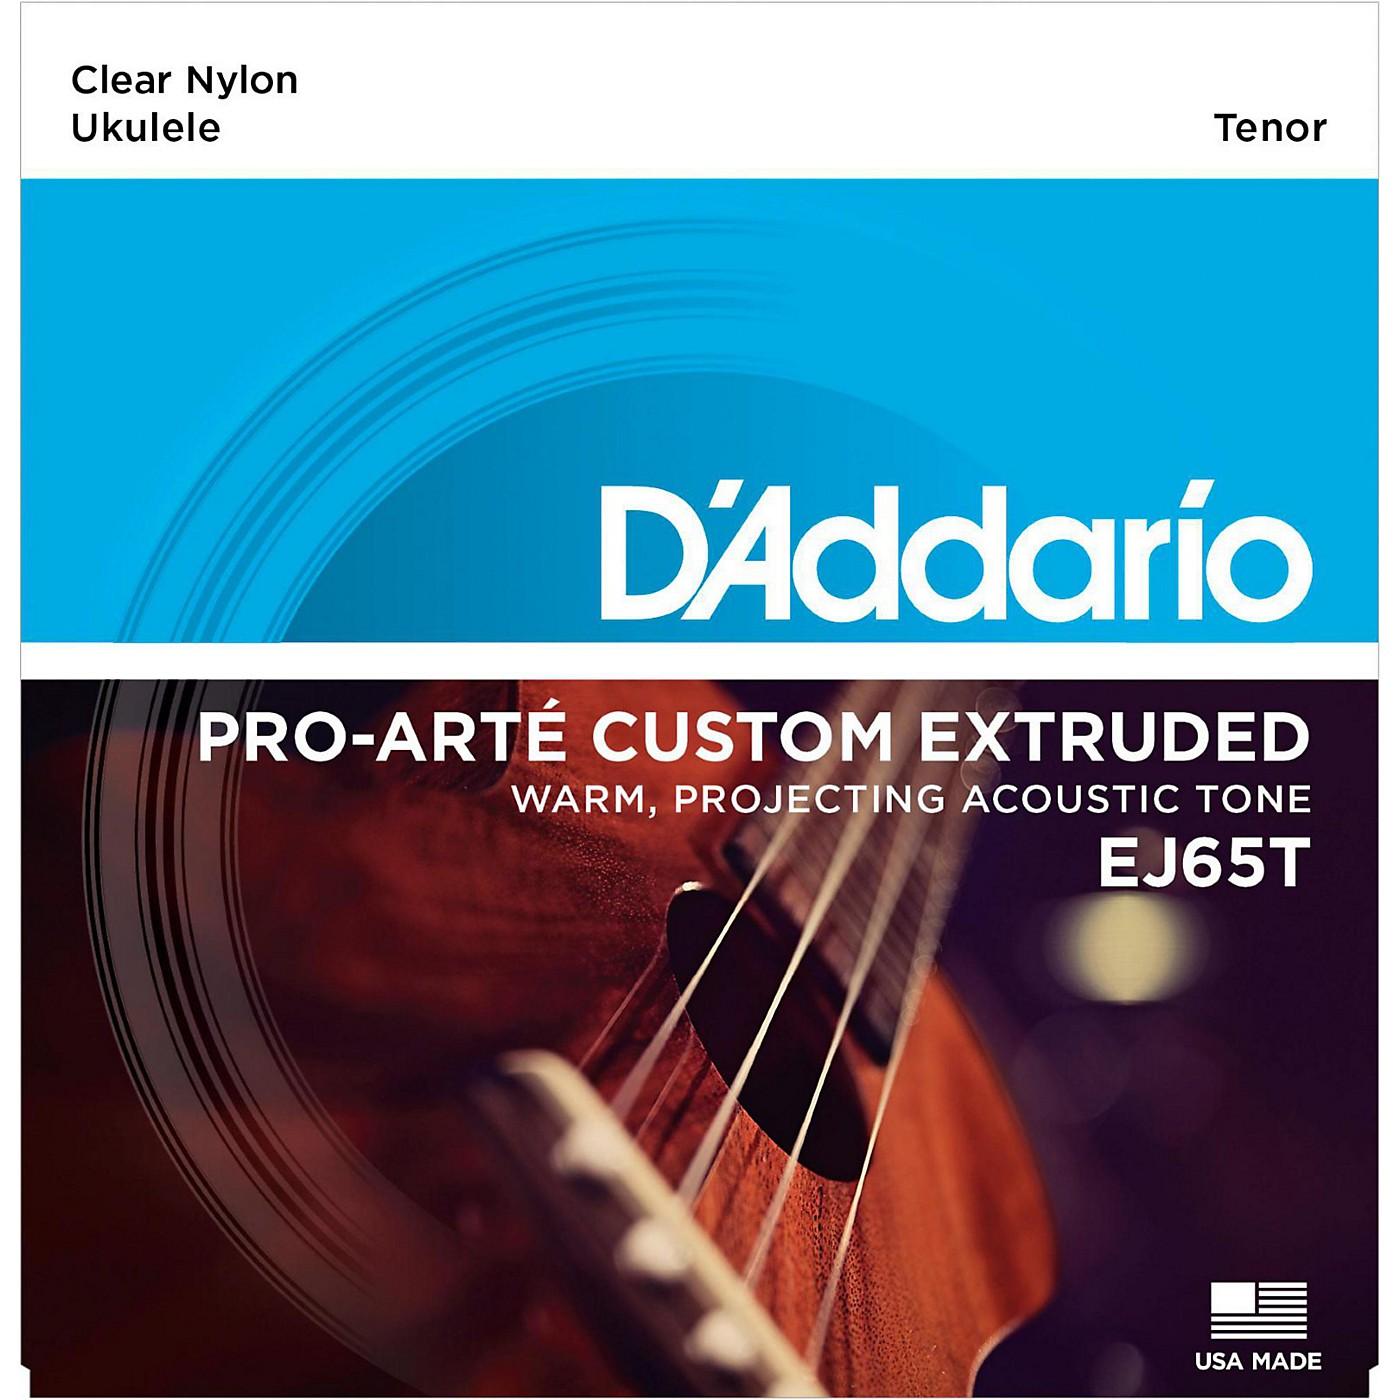 D'Addario EJ65T Pro-Arte Custom Extruded Tenor Nylon Ukulele Strings thumbnail